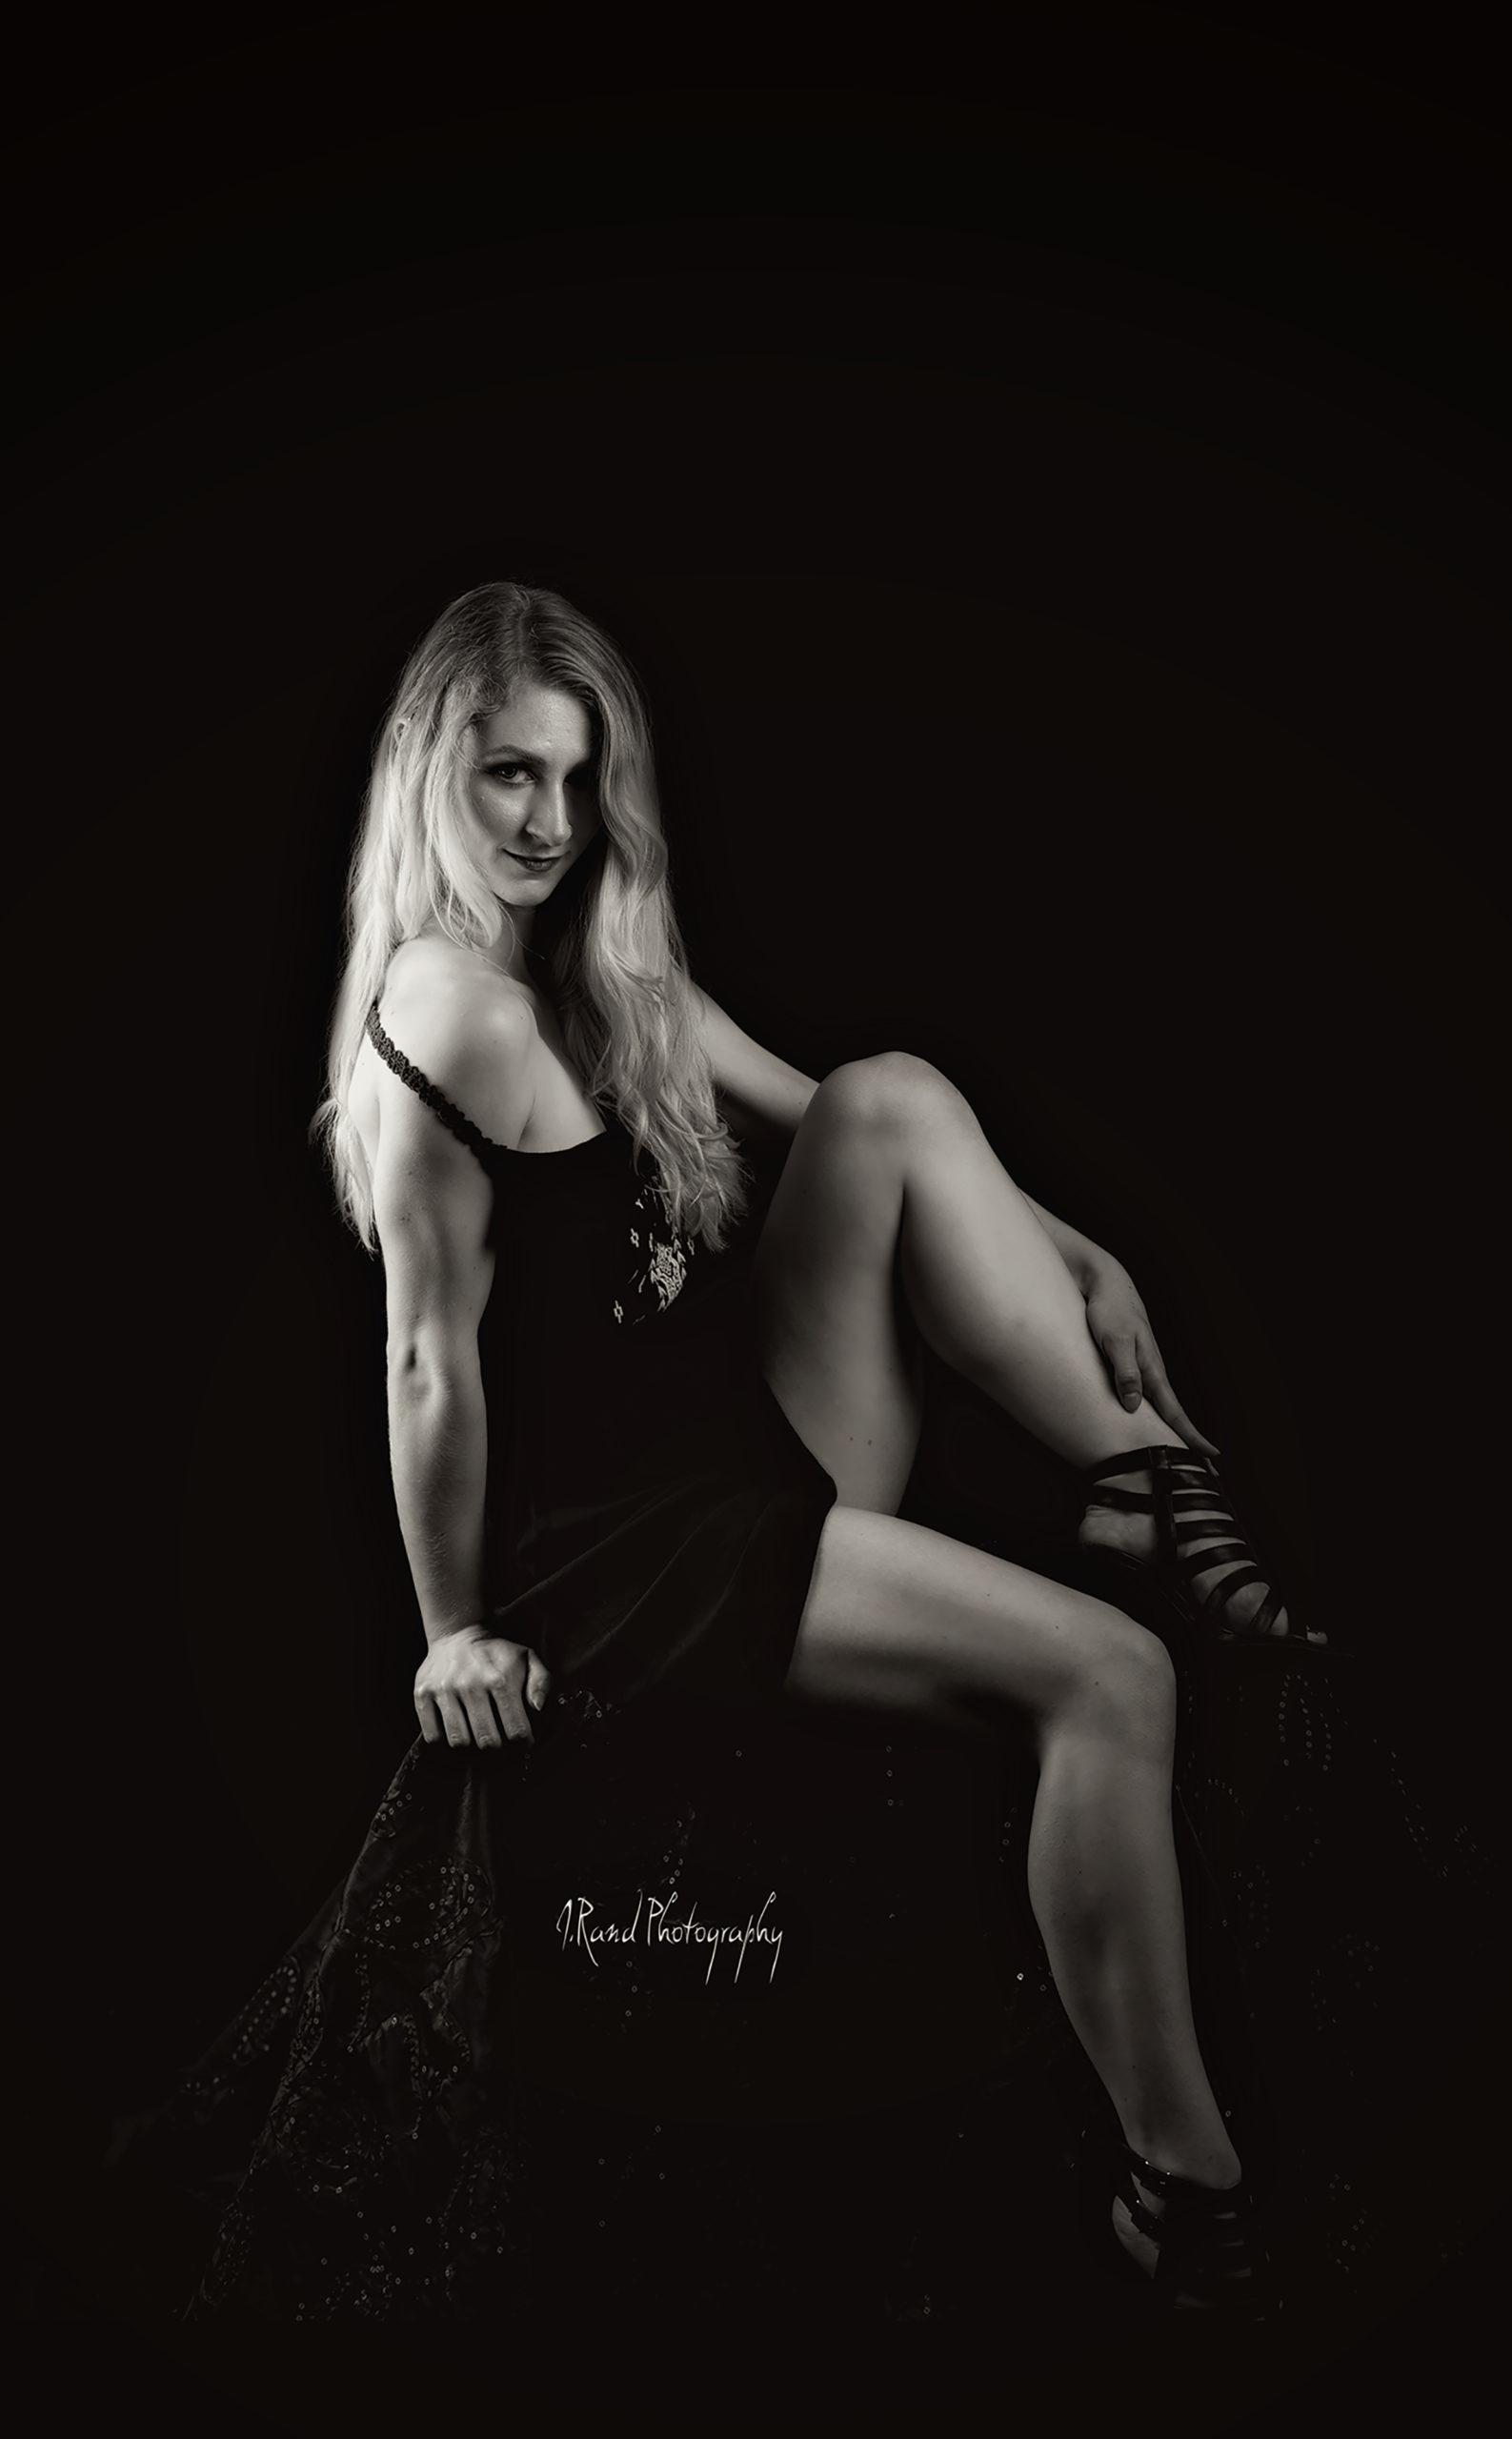 Janelle IG jdb.creative Edmonton model